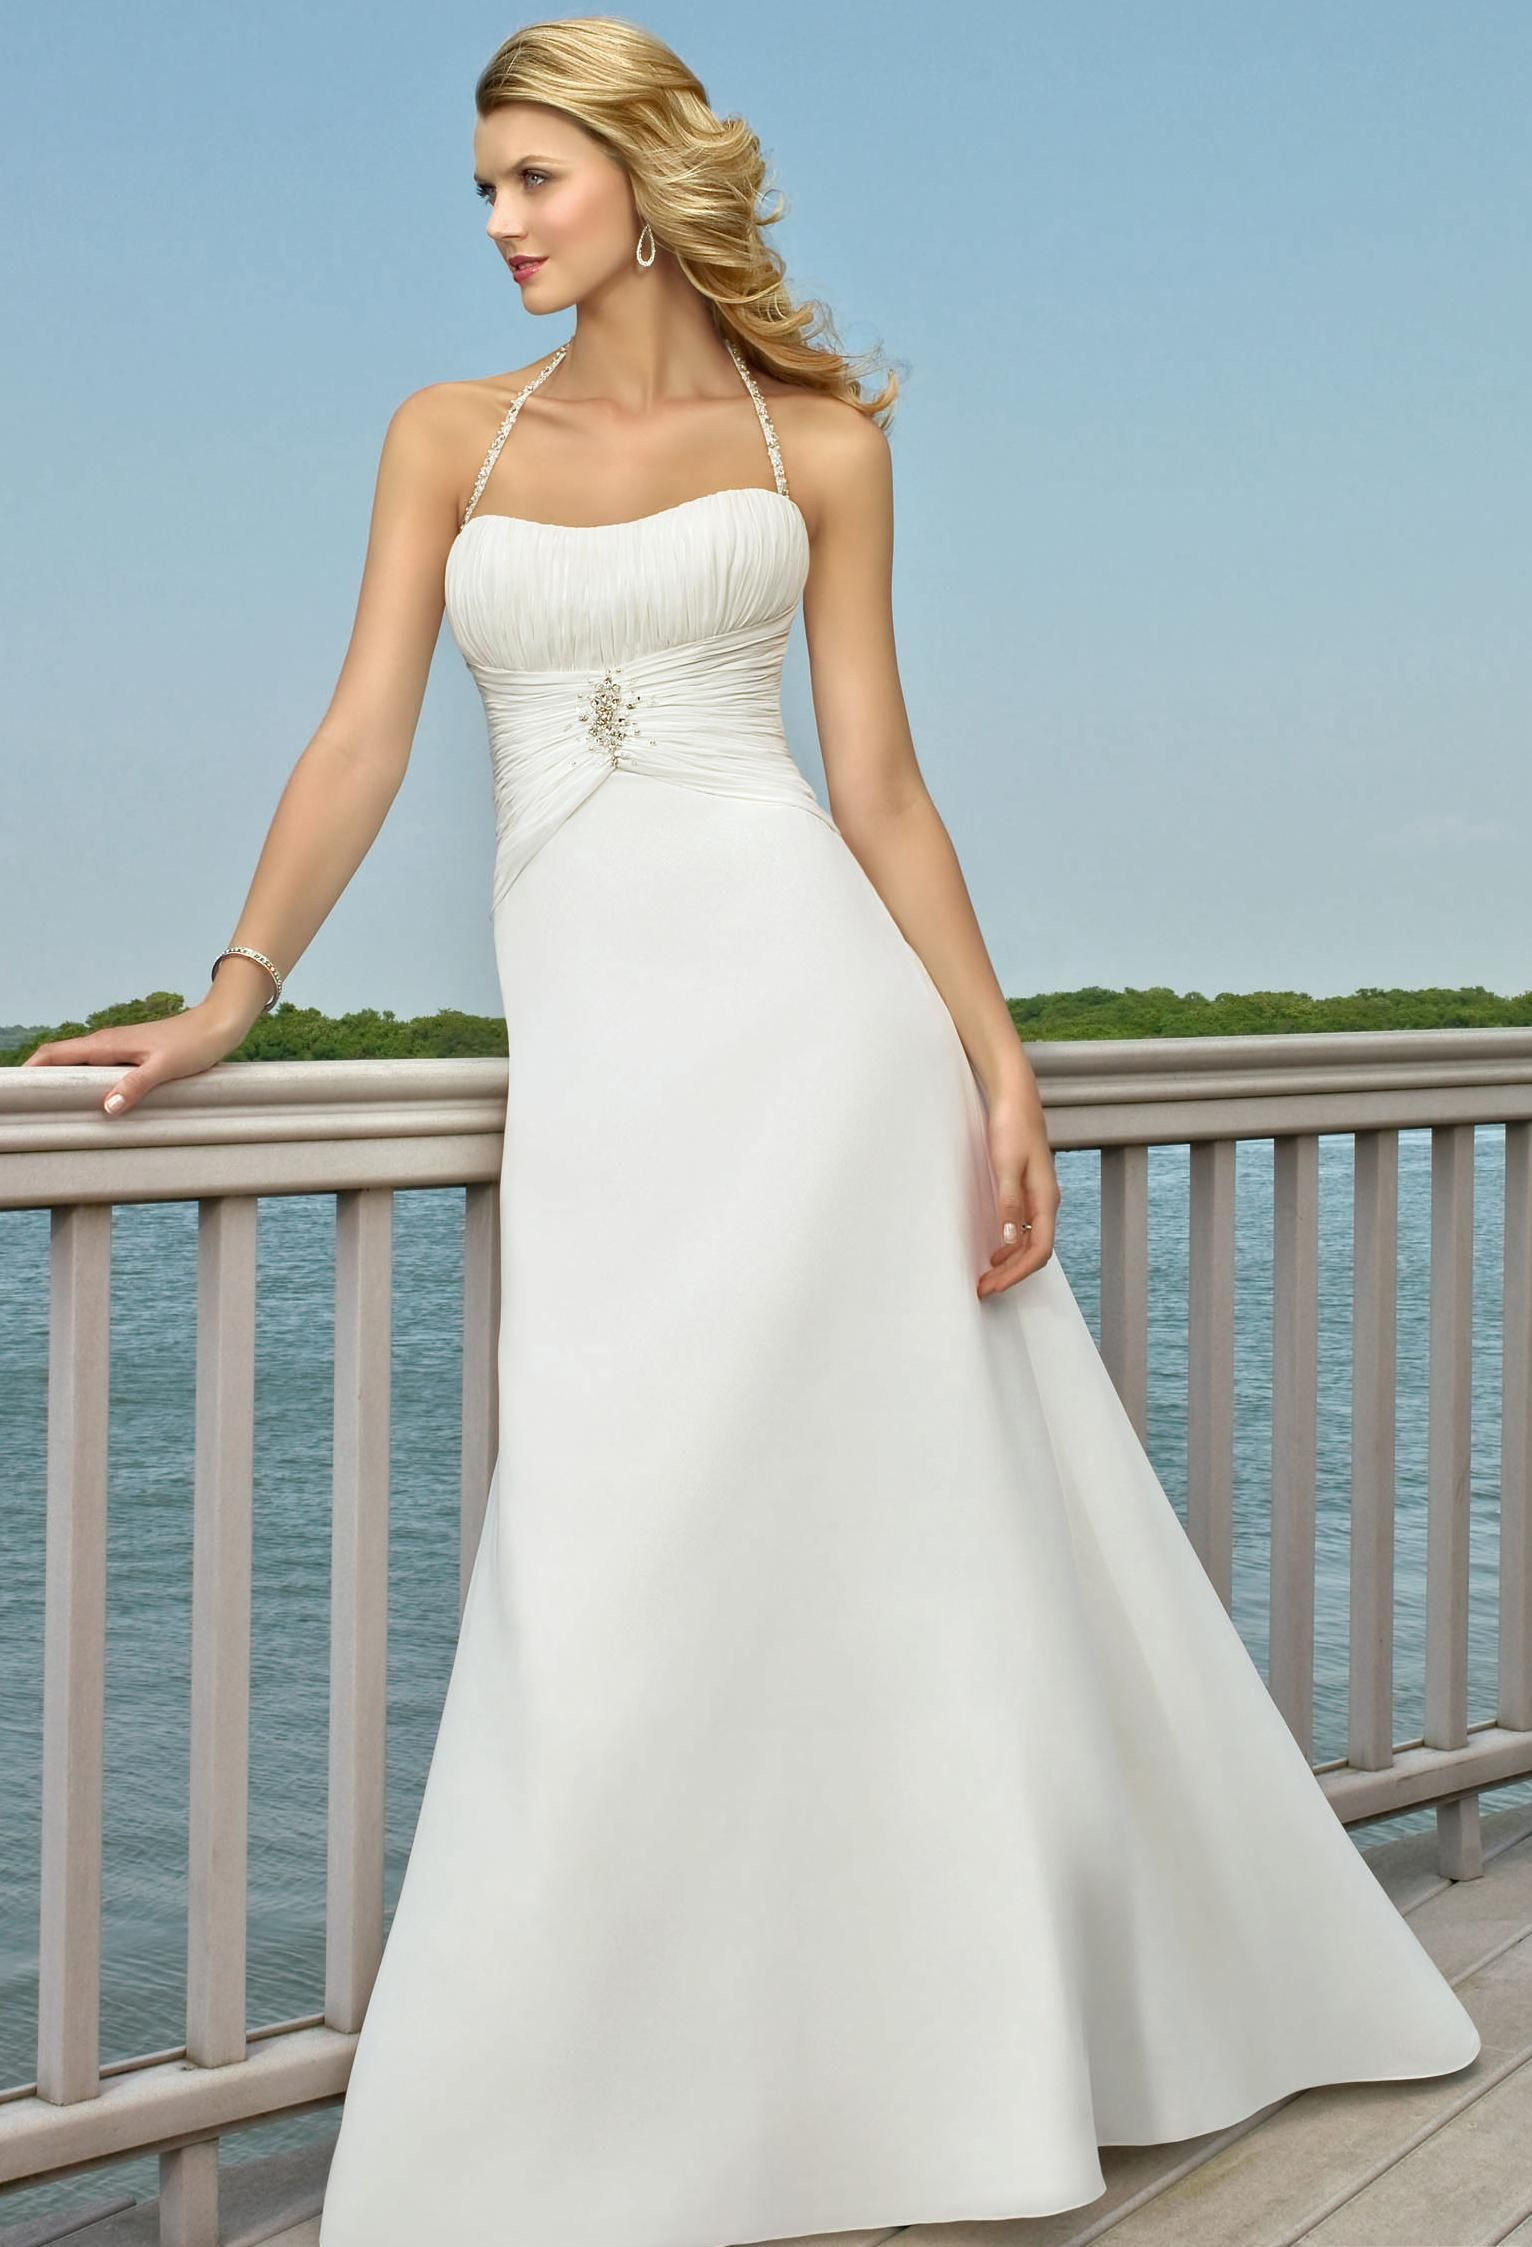 wedding dresses?princess wedding dresses with sleeves?wedding ...